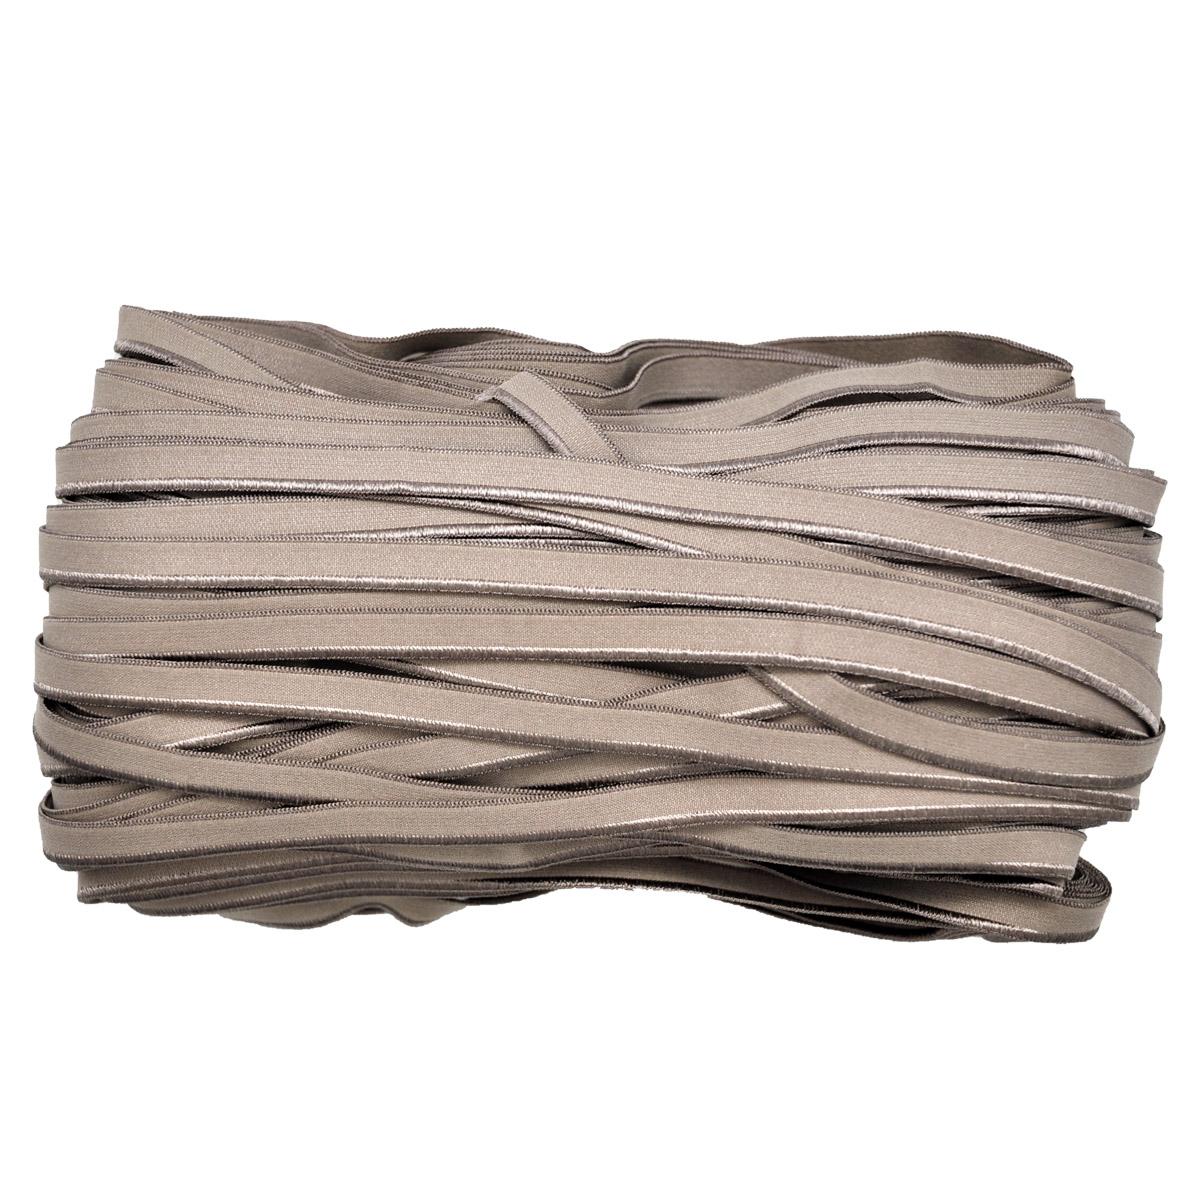 STP/38 эластичная отделочная лента 8мм*50м, серо-бежевый